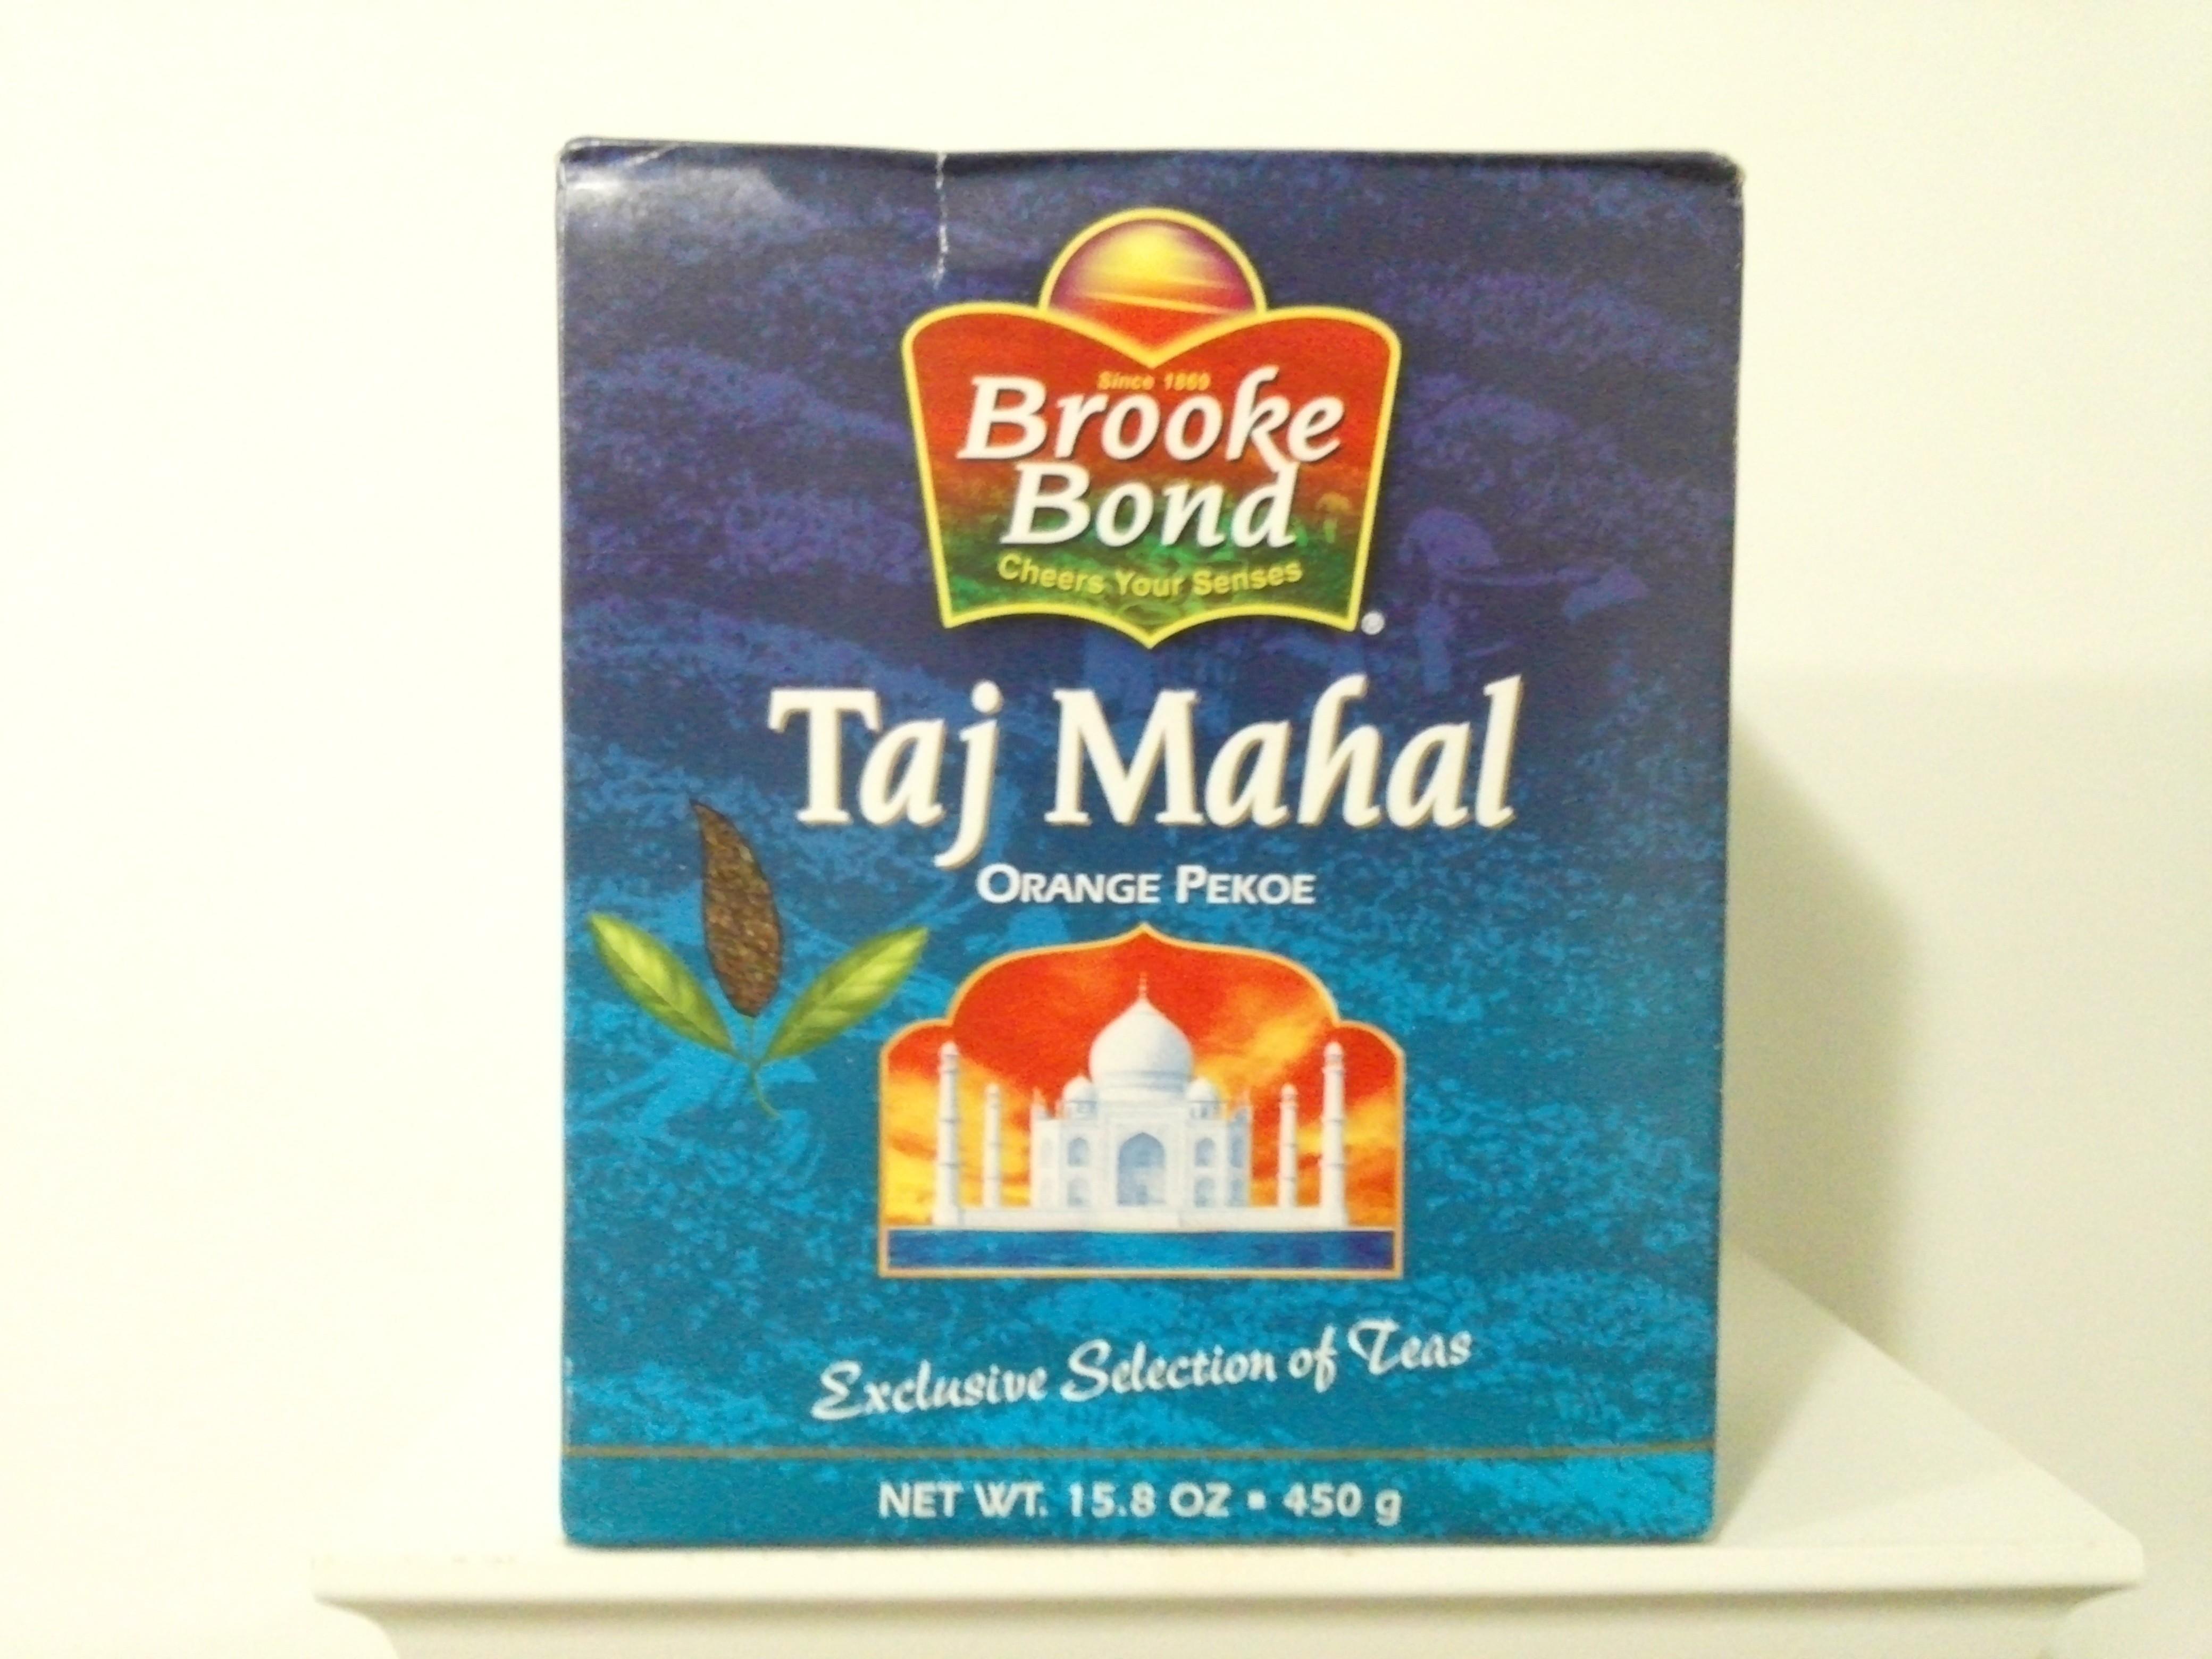 Brooke Bond Taj Mahal Tea 450 grm